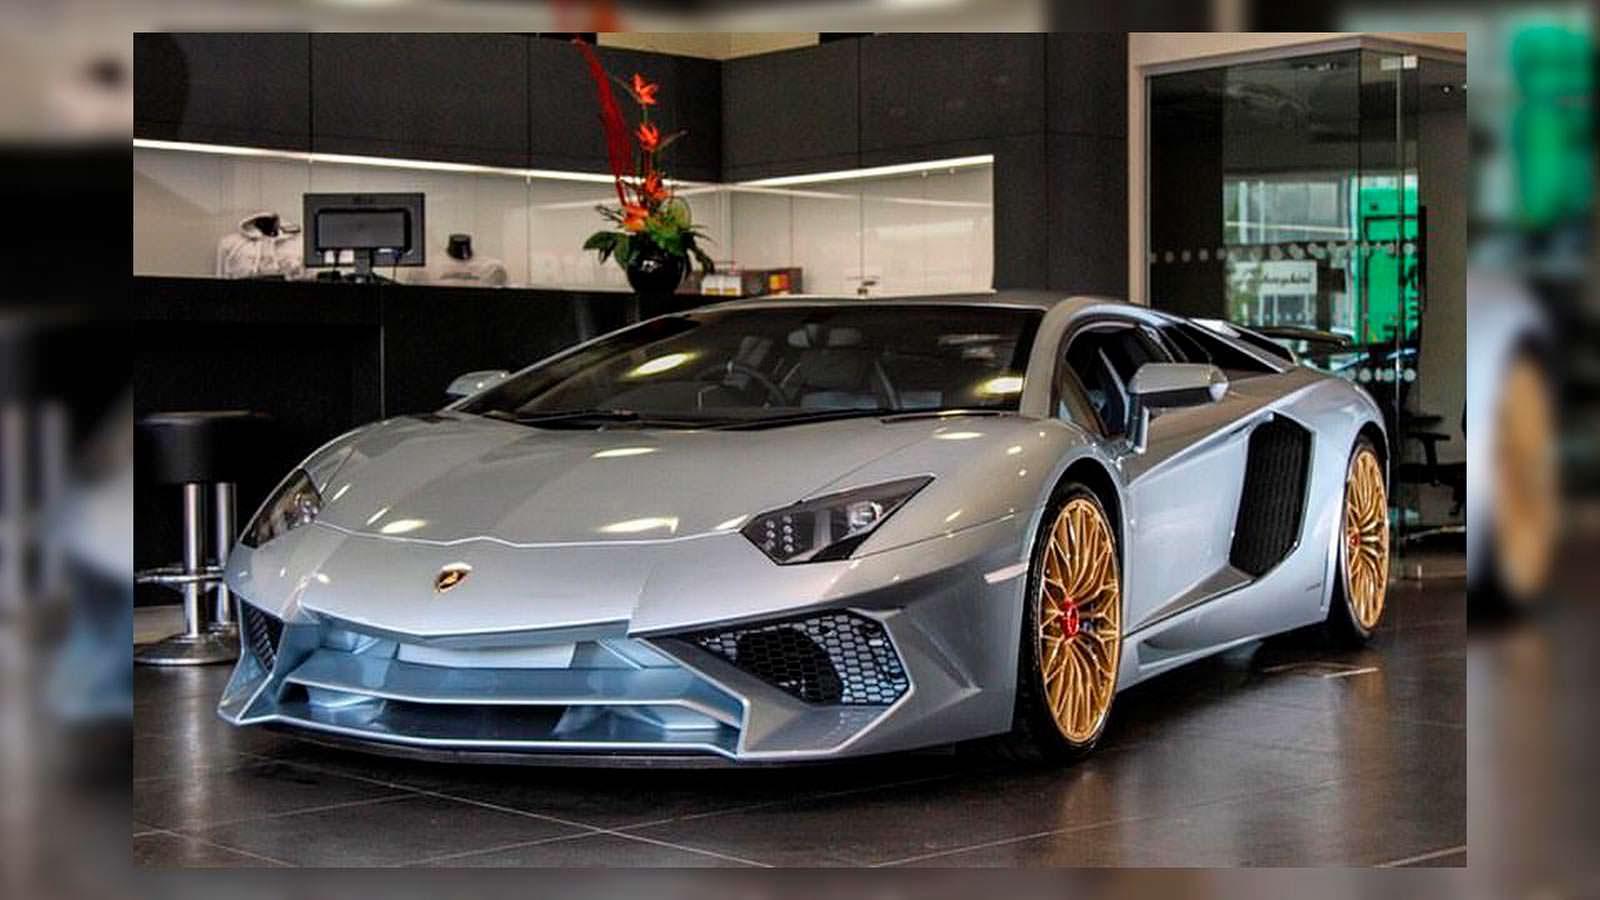 Последний Lamborghini Aventador SV цвета Liquid Metal Blue